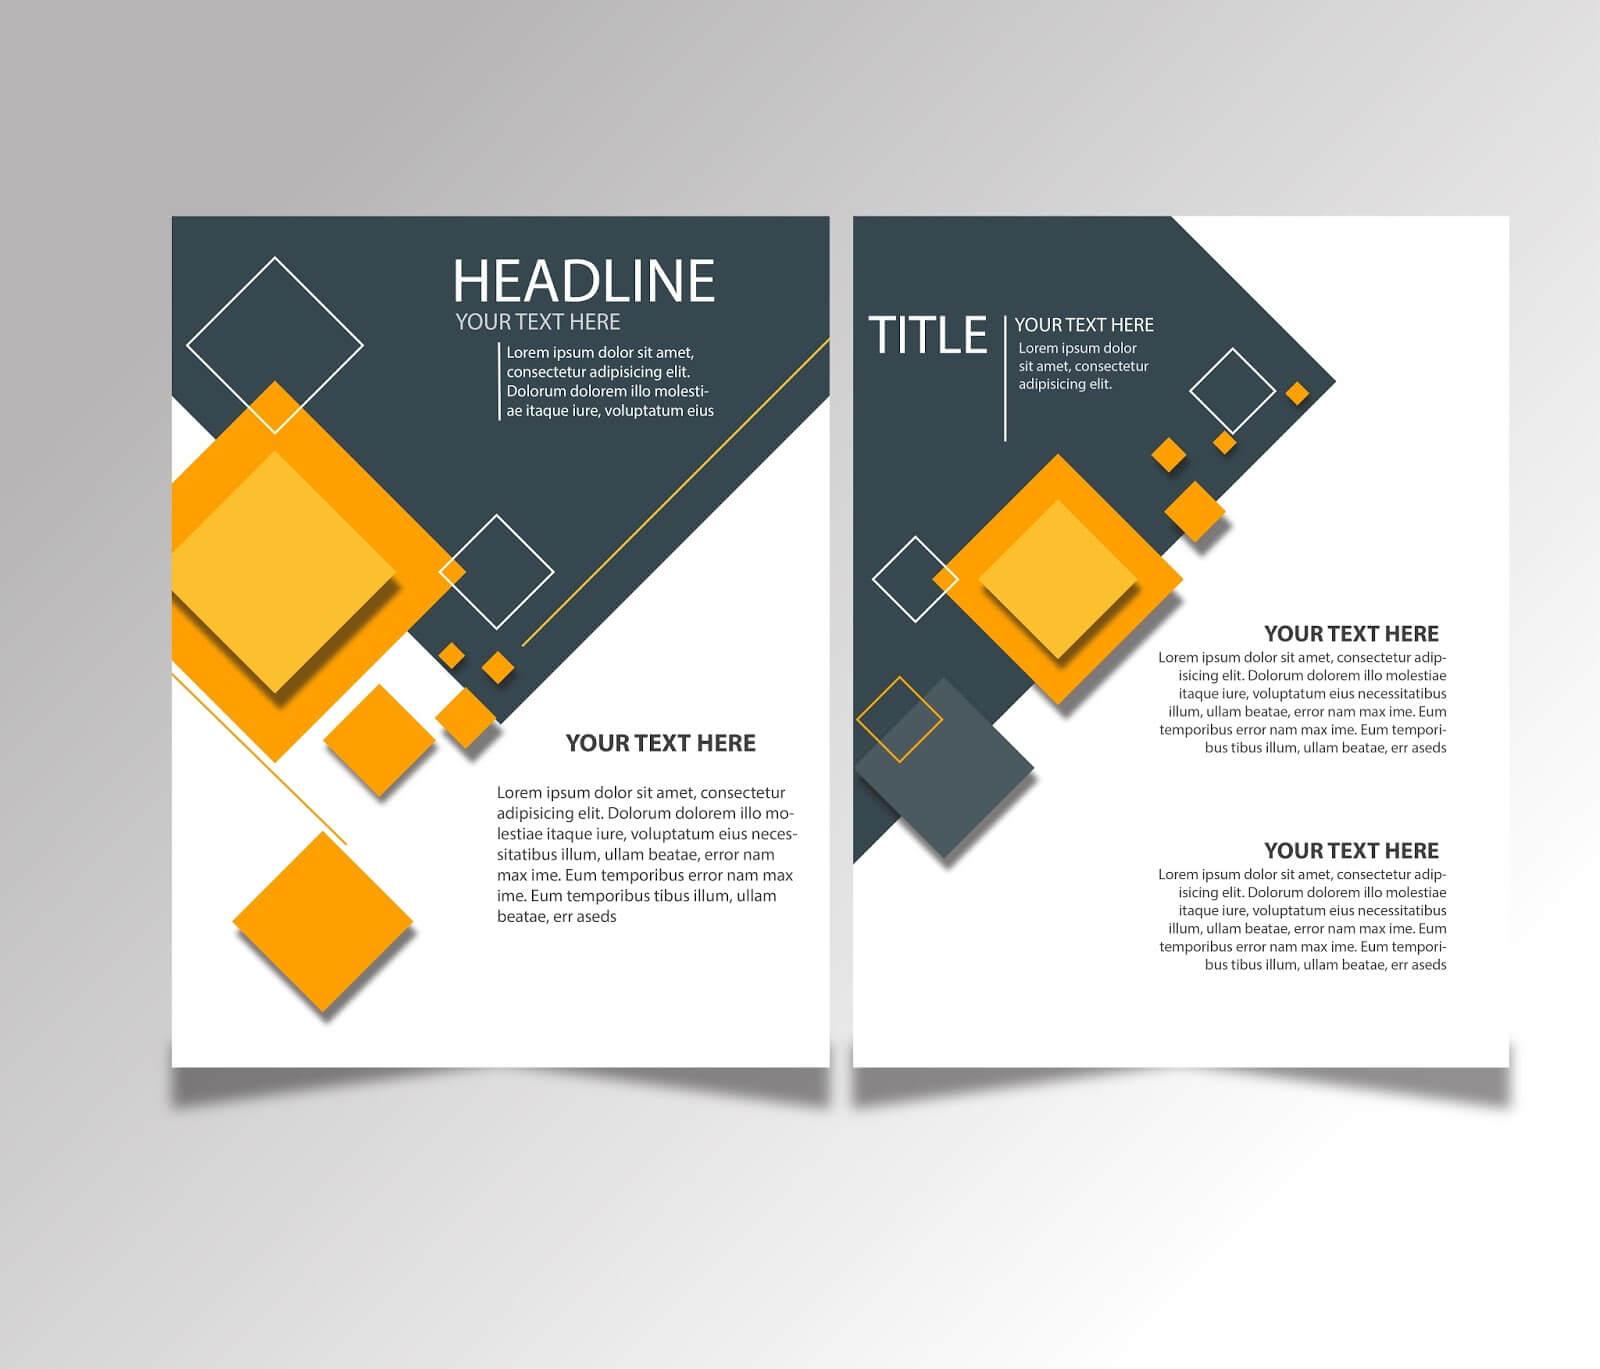 Free Download Brochure Design Templates Ai Files - Ideosprocess For Ai Brochure Templates Free Download